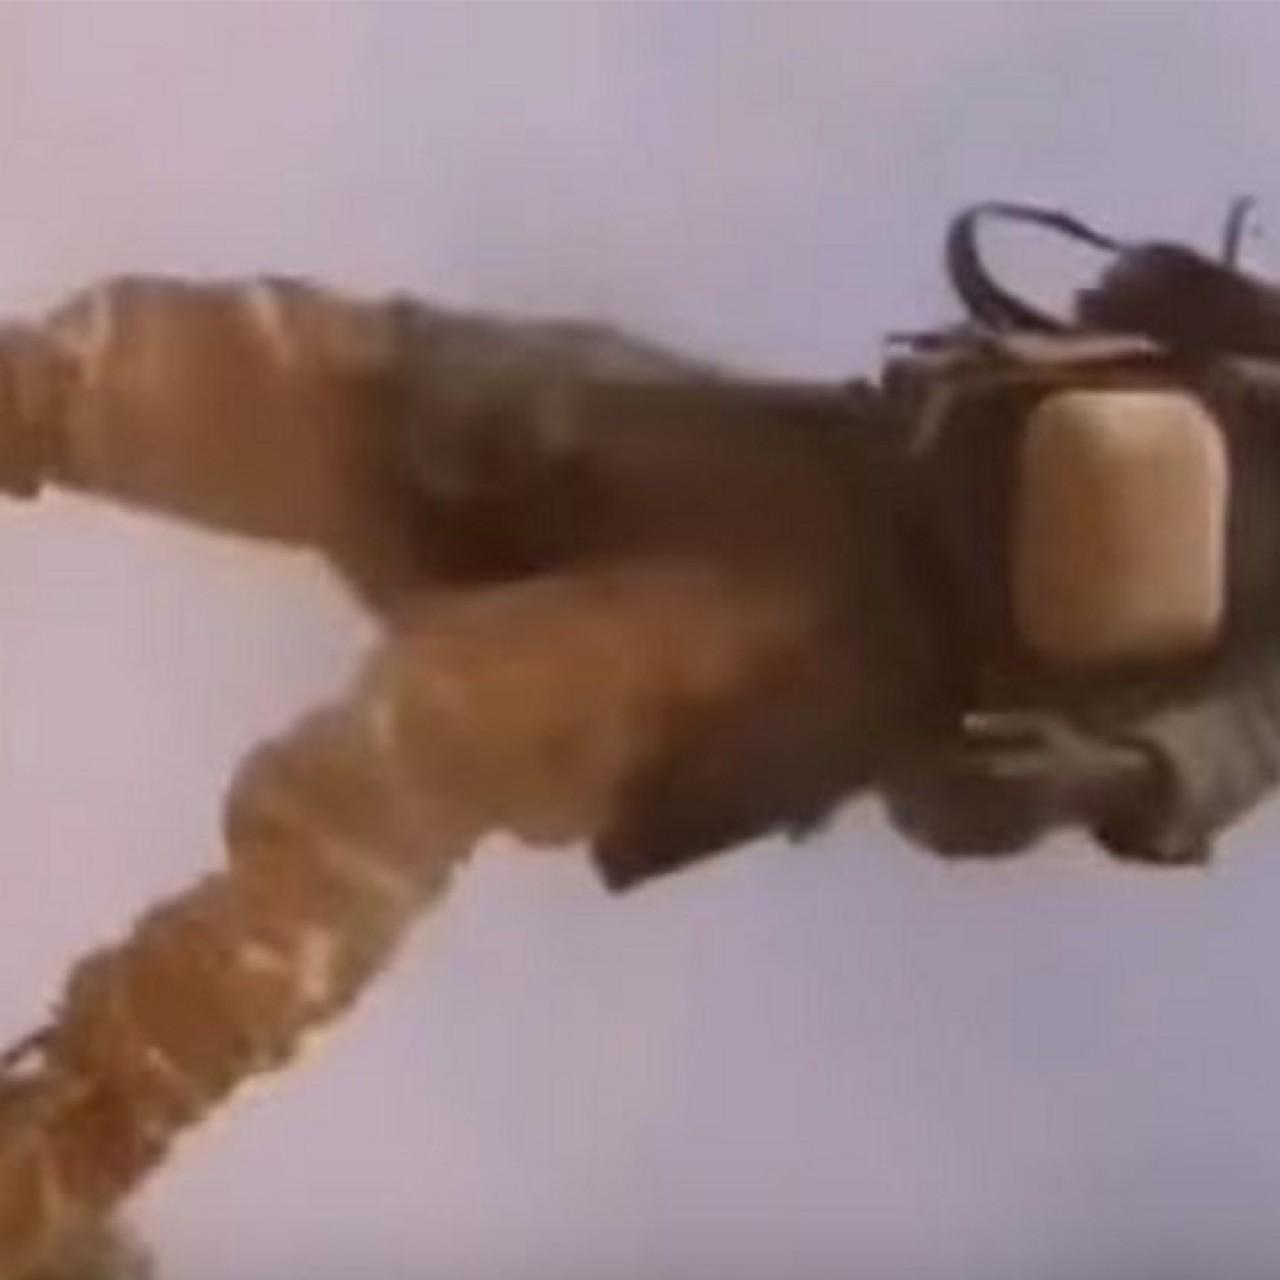 Chilling helmet-cam video, stolen from dead US soldier, shows ambush